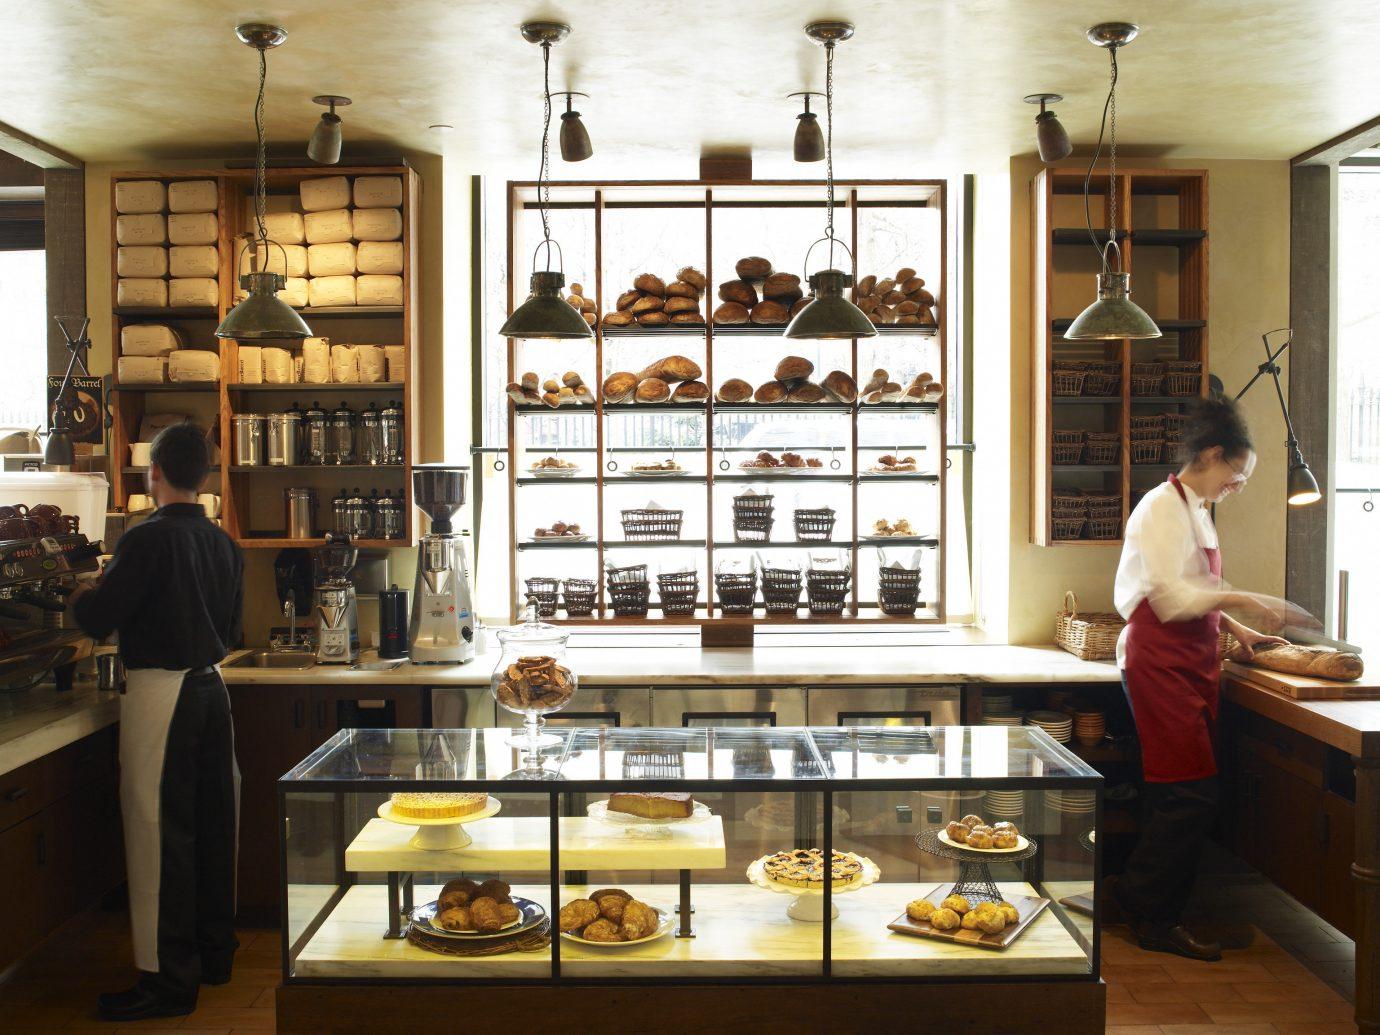 Food + Drink indoor wall floor bakery restaurant meal interior design food sense Boutique Design coffeehouse